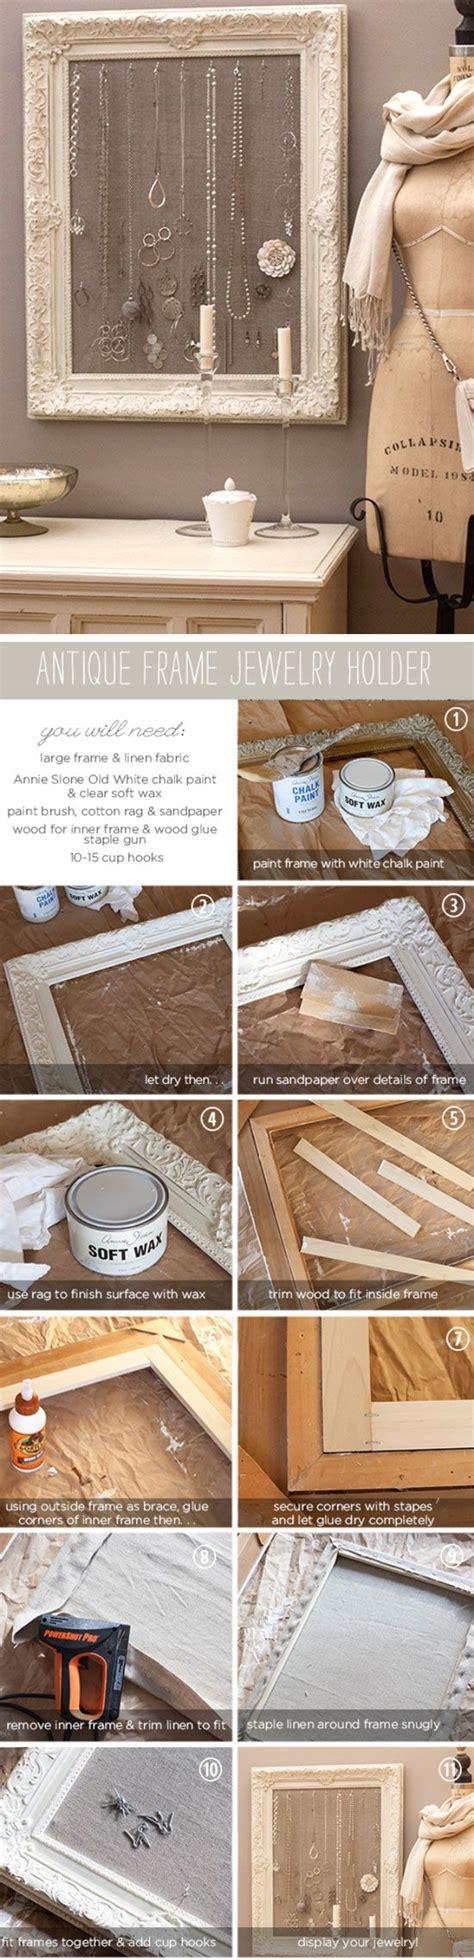 dollar store home decor ideas 20 excellent dollar store home decor ideas